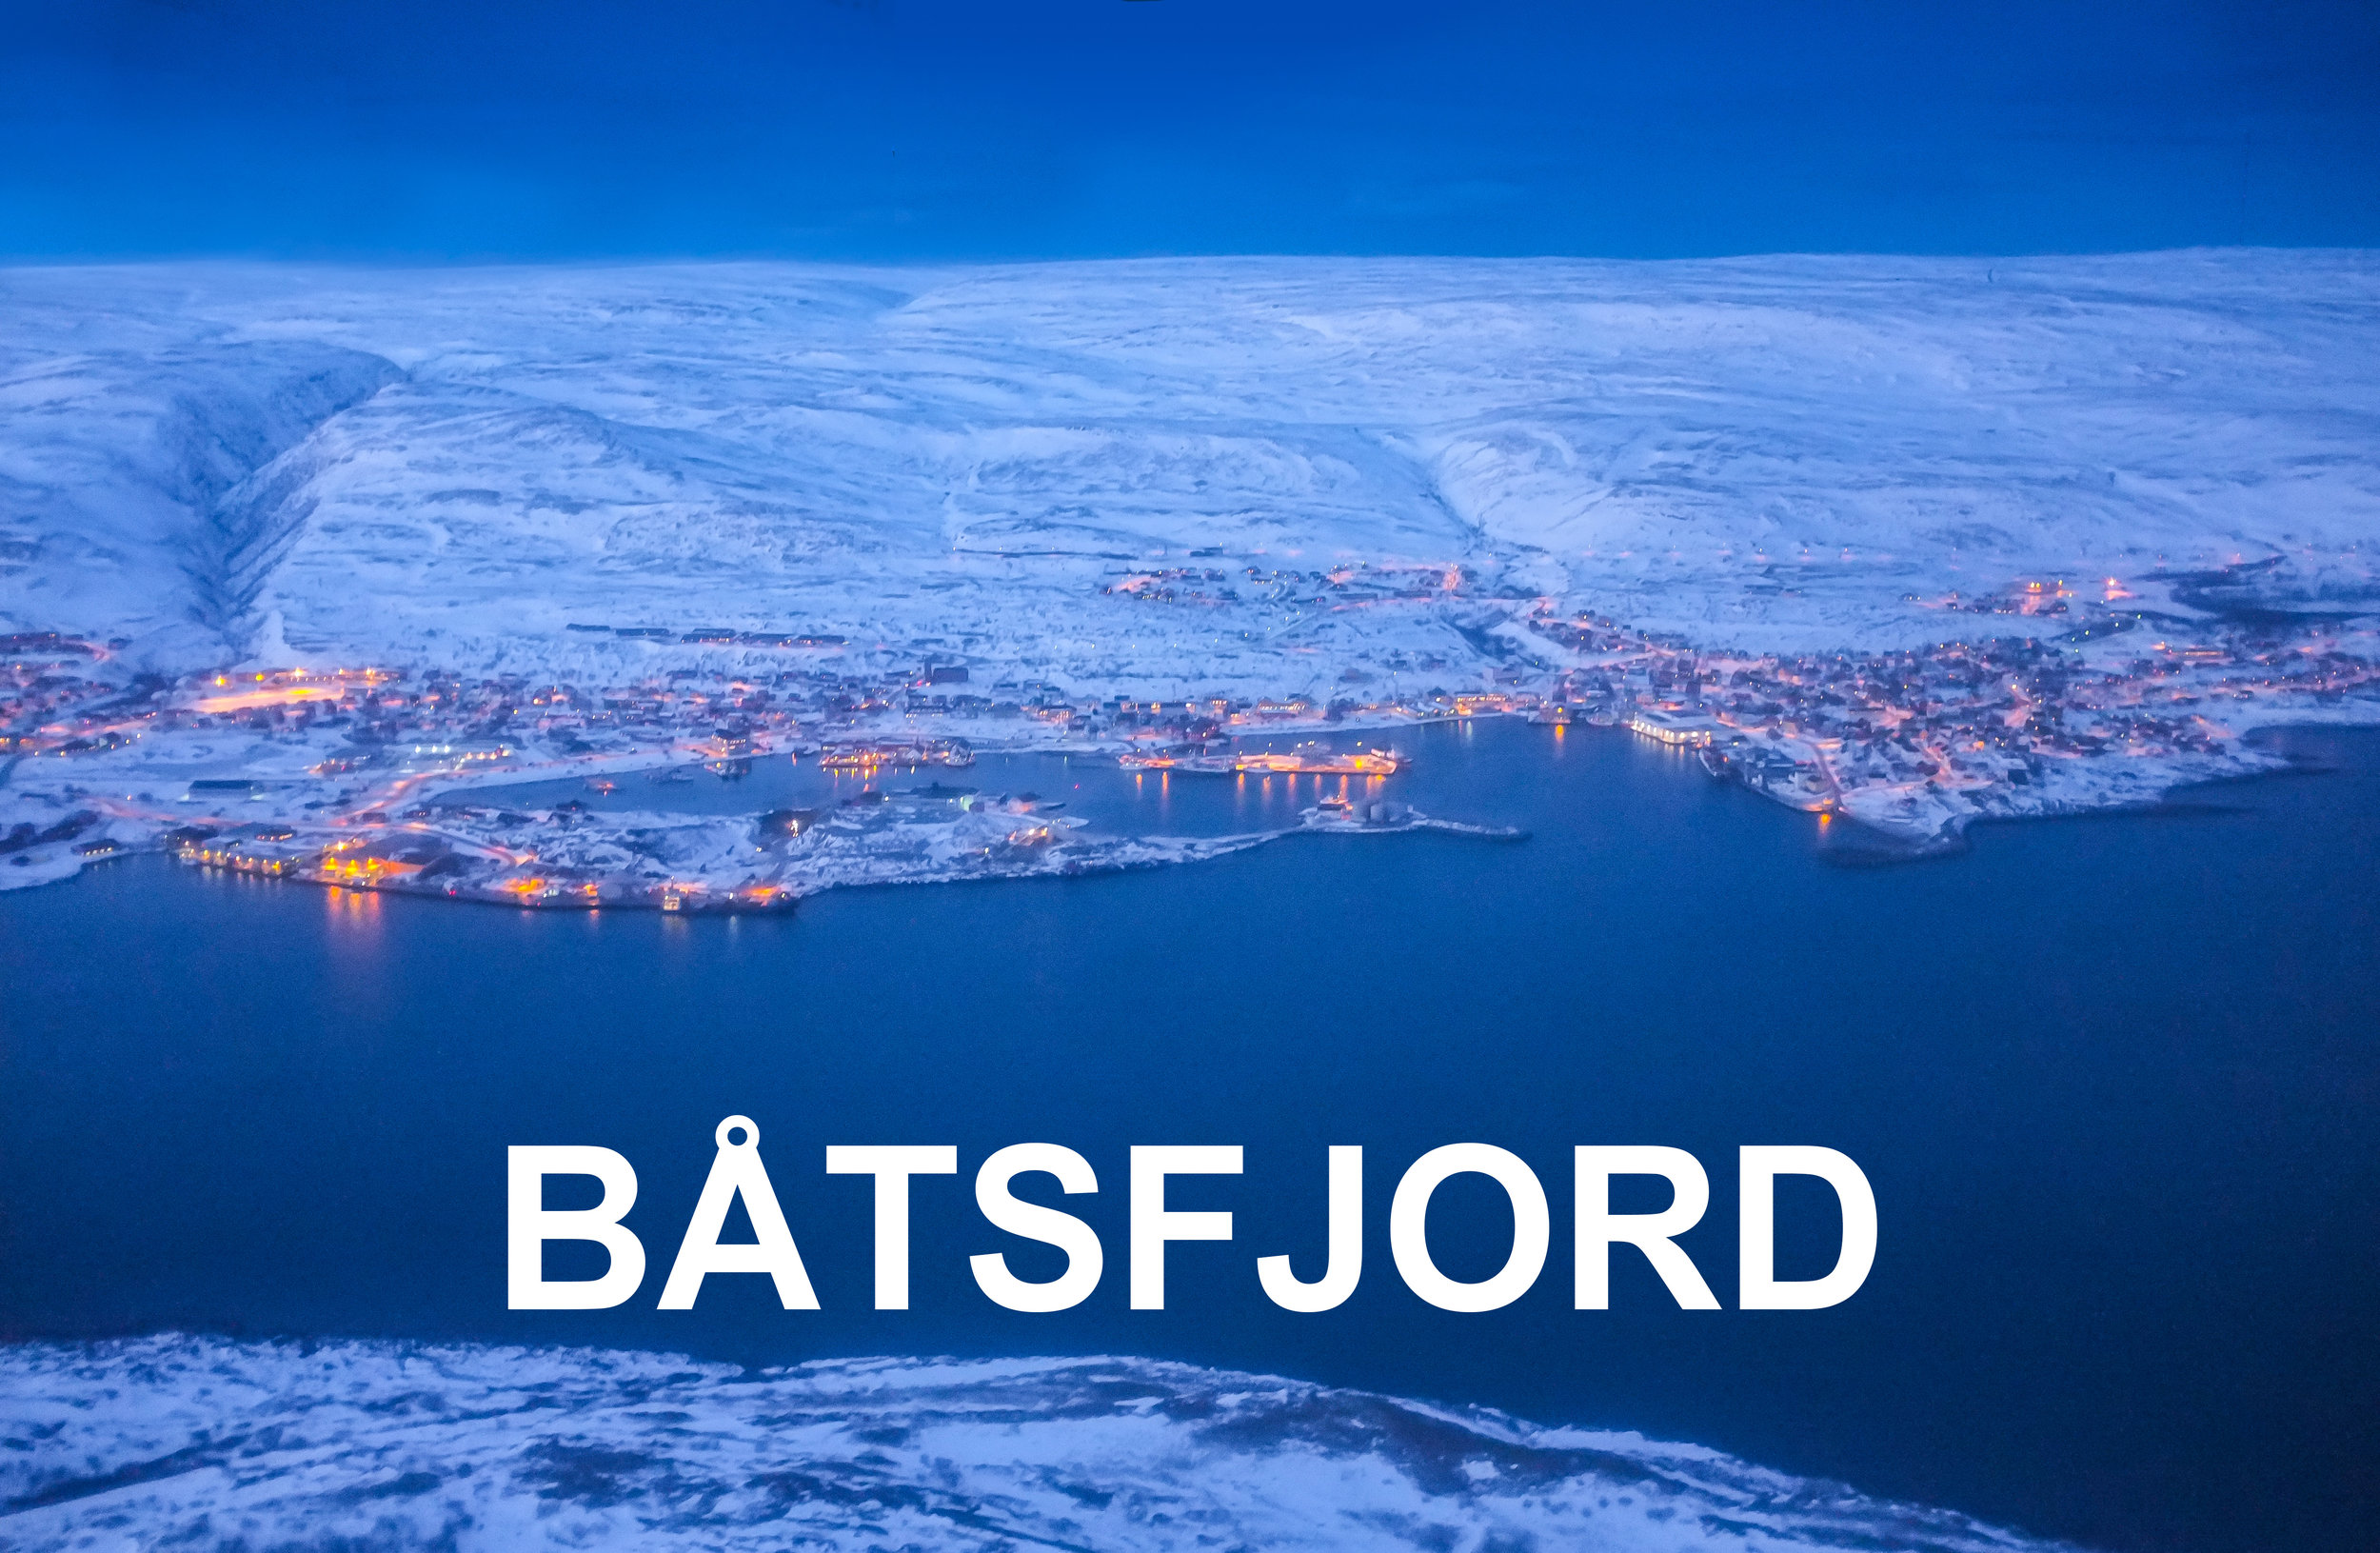 Båtsfjord Varanger areal copyright Biotope